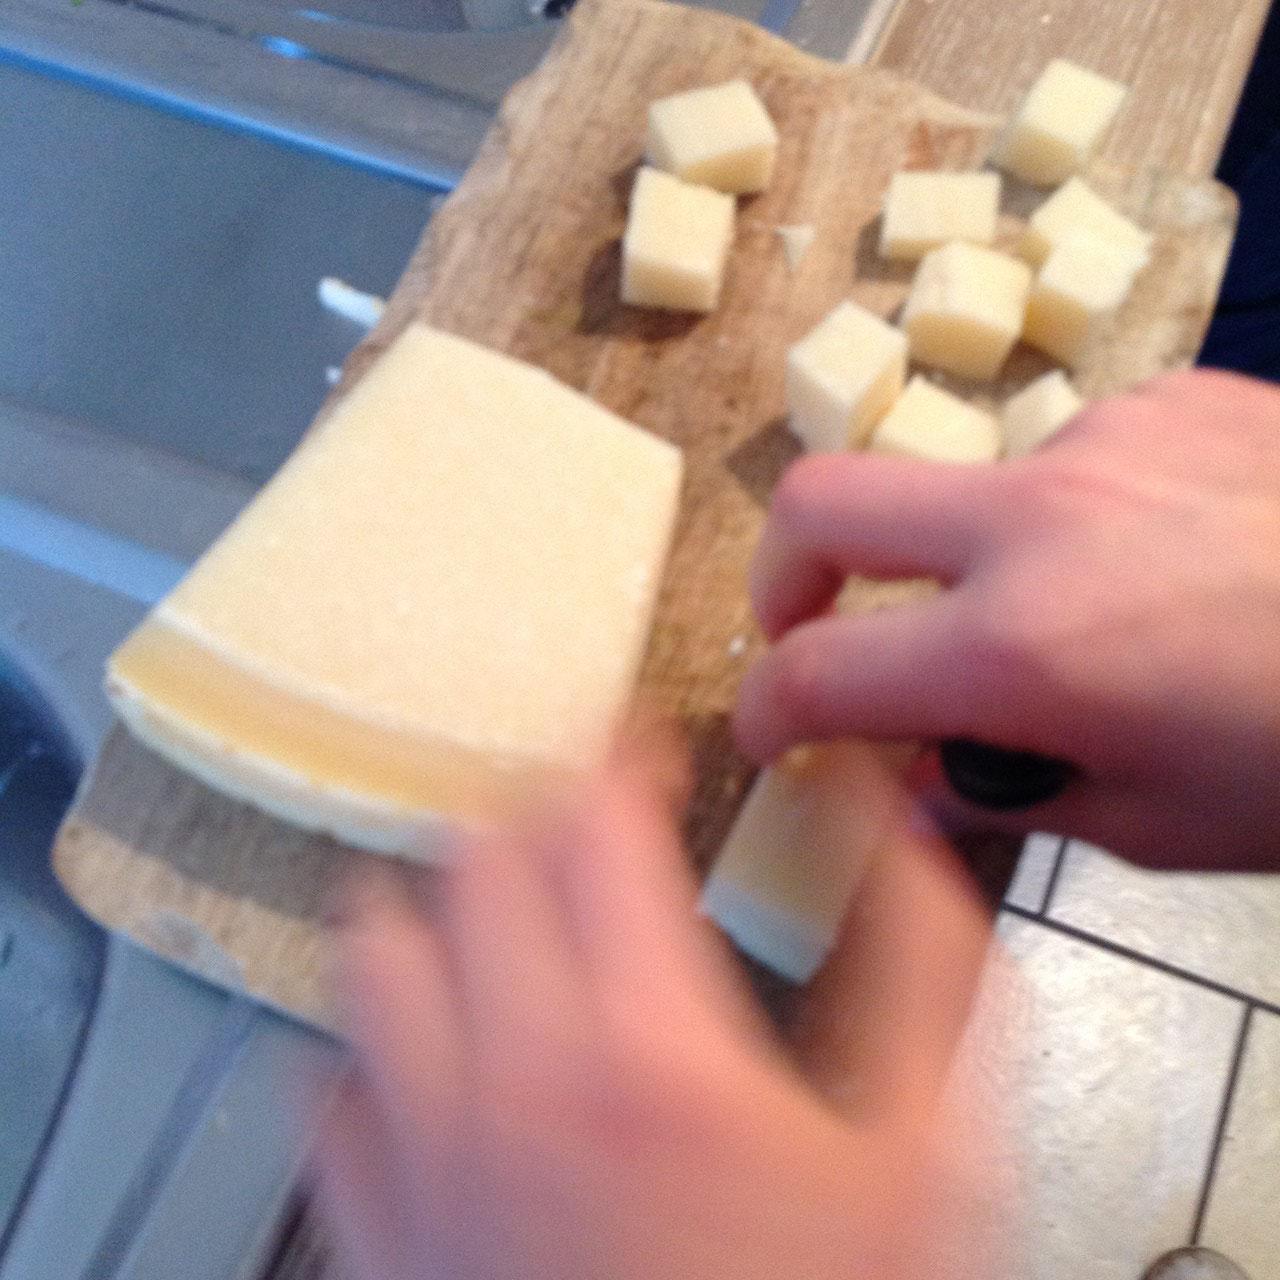 Das ist Parmesan-Käse.